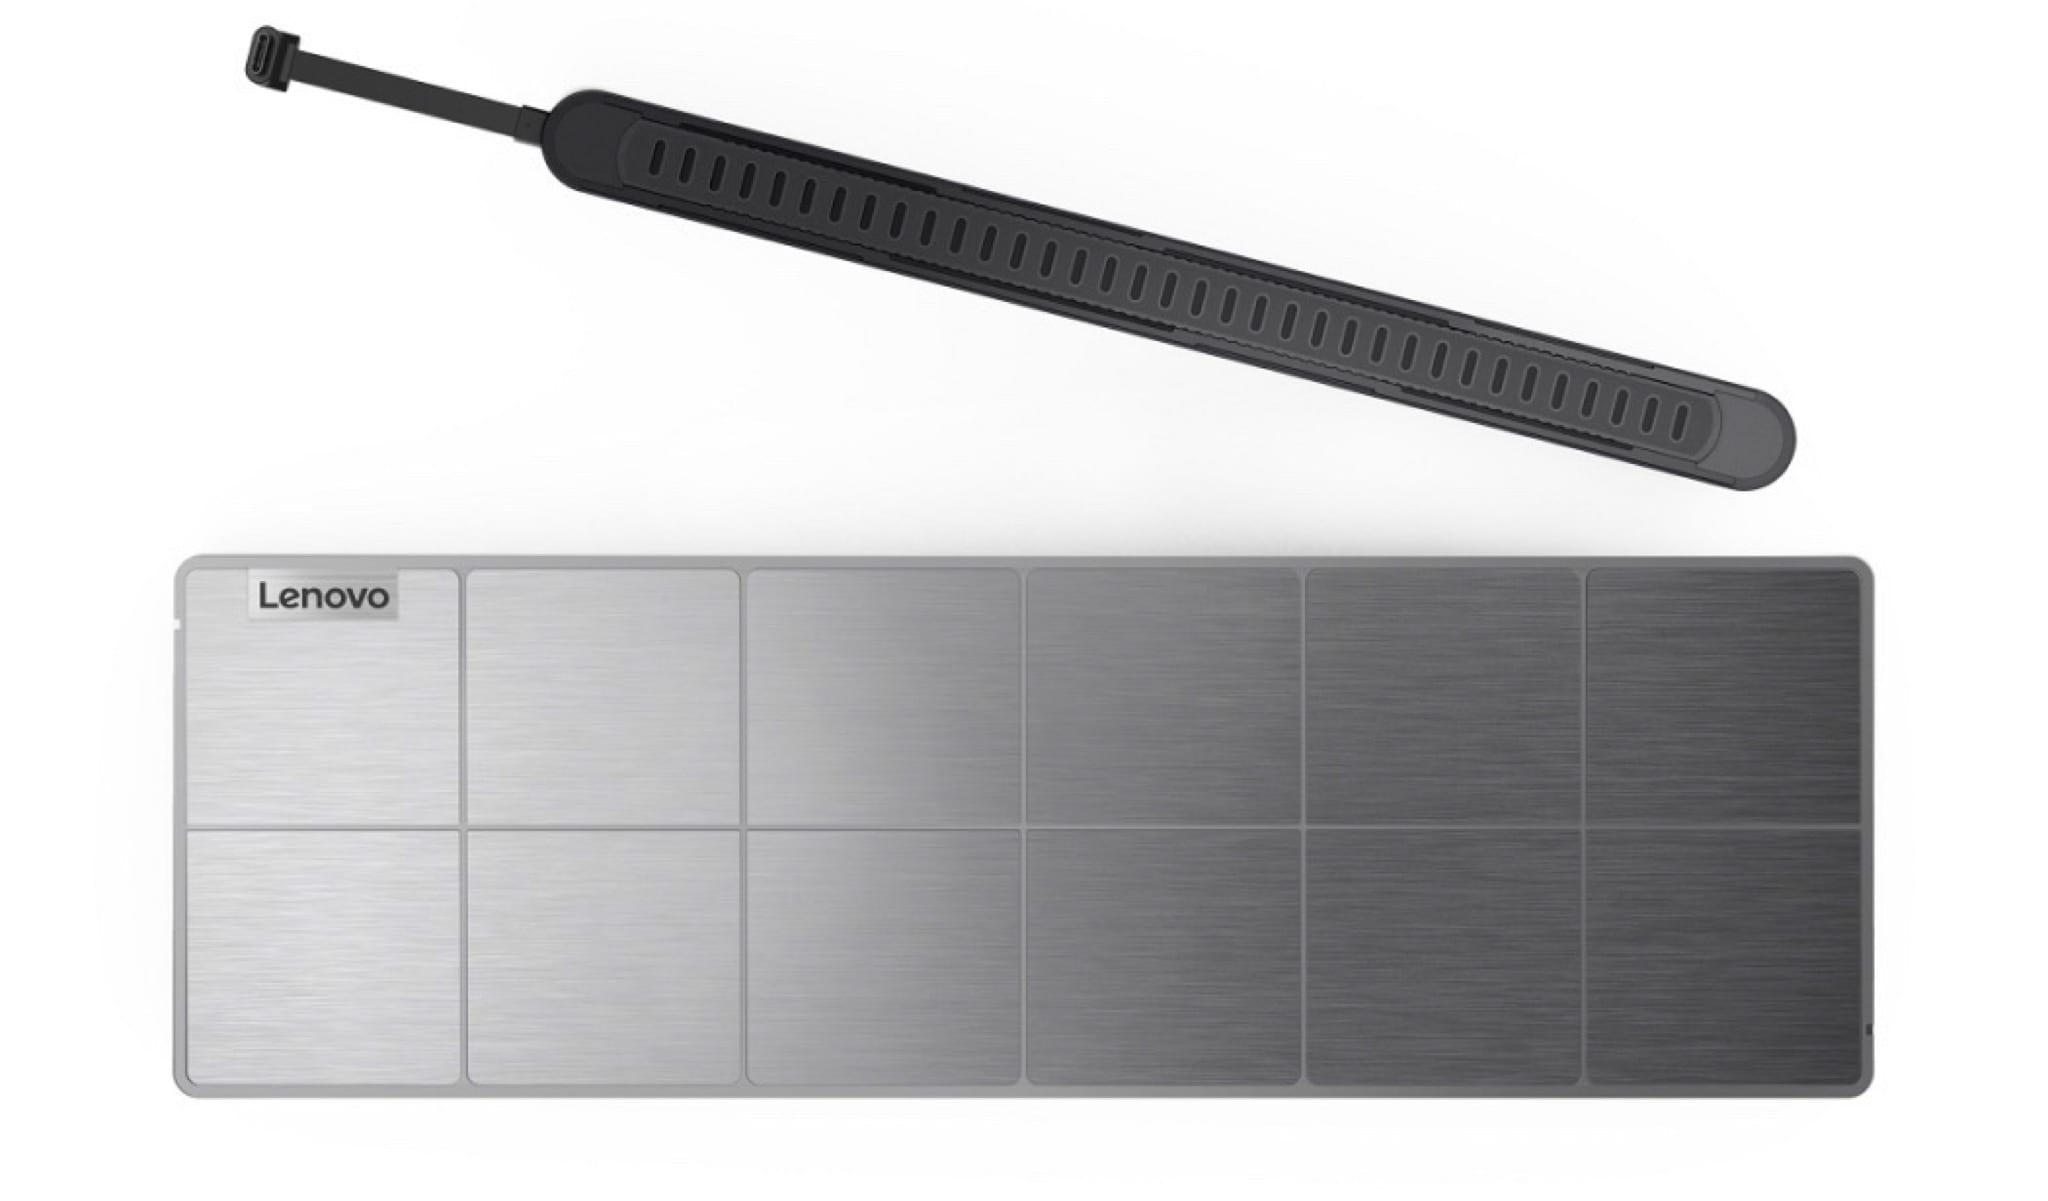 Lenovo Go Wireless Charging Kit